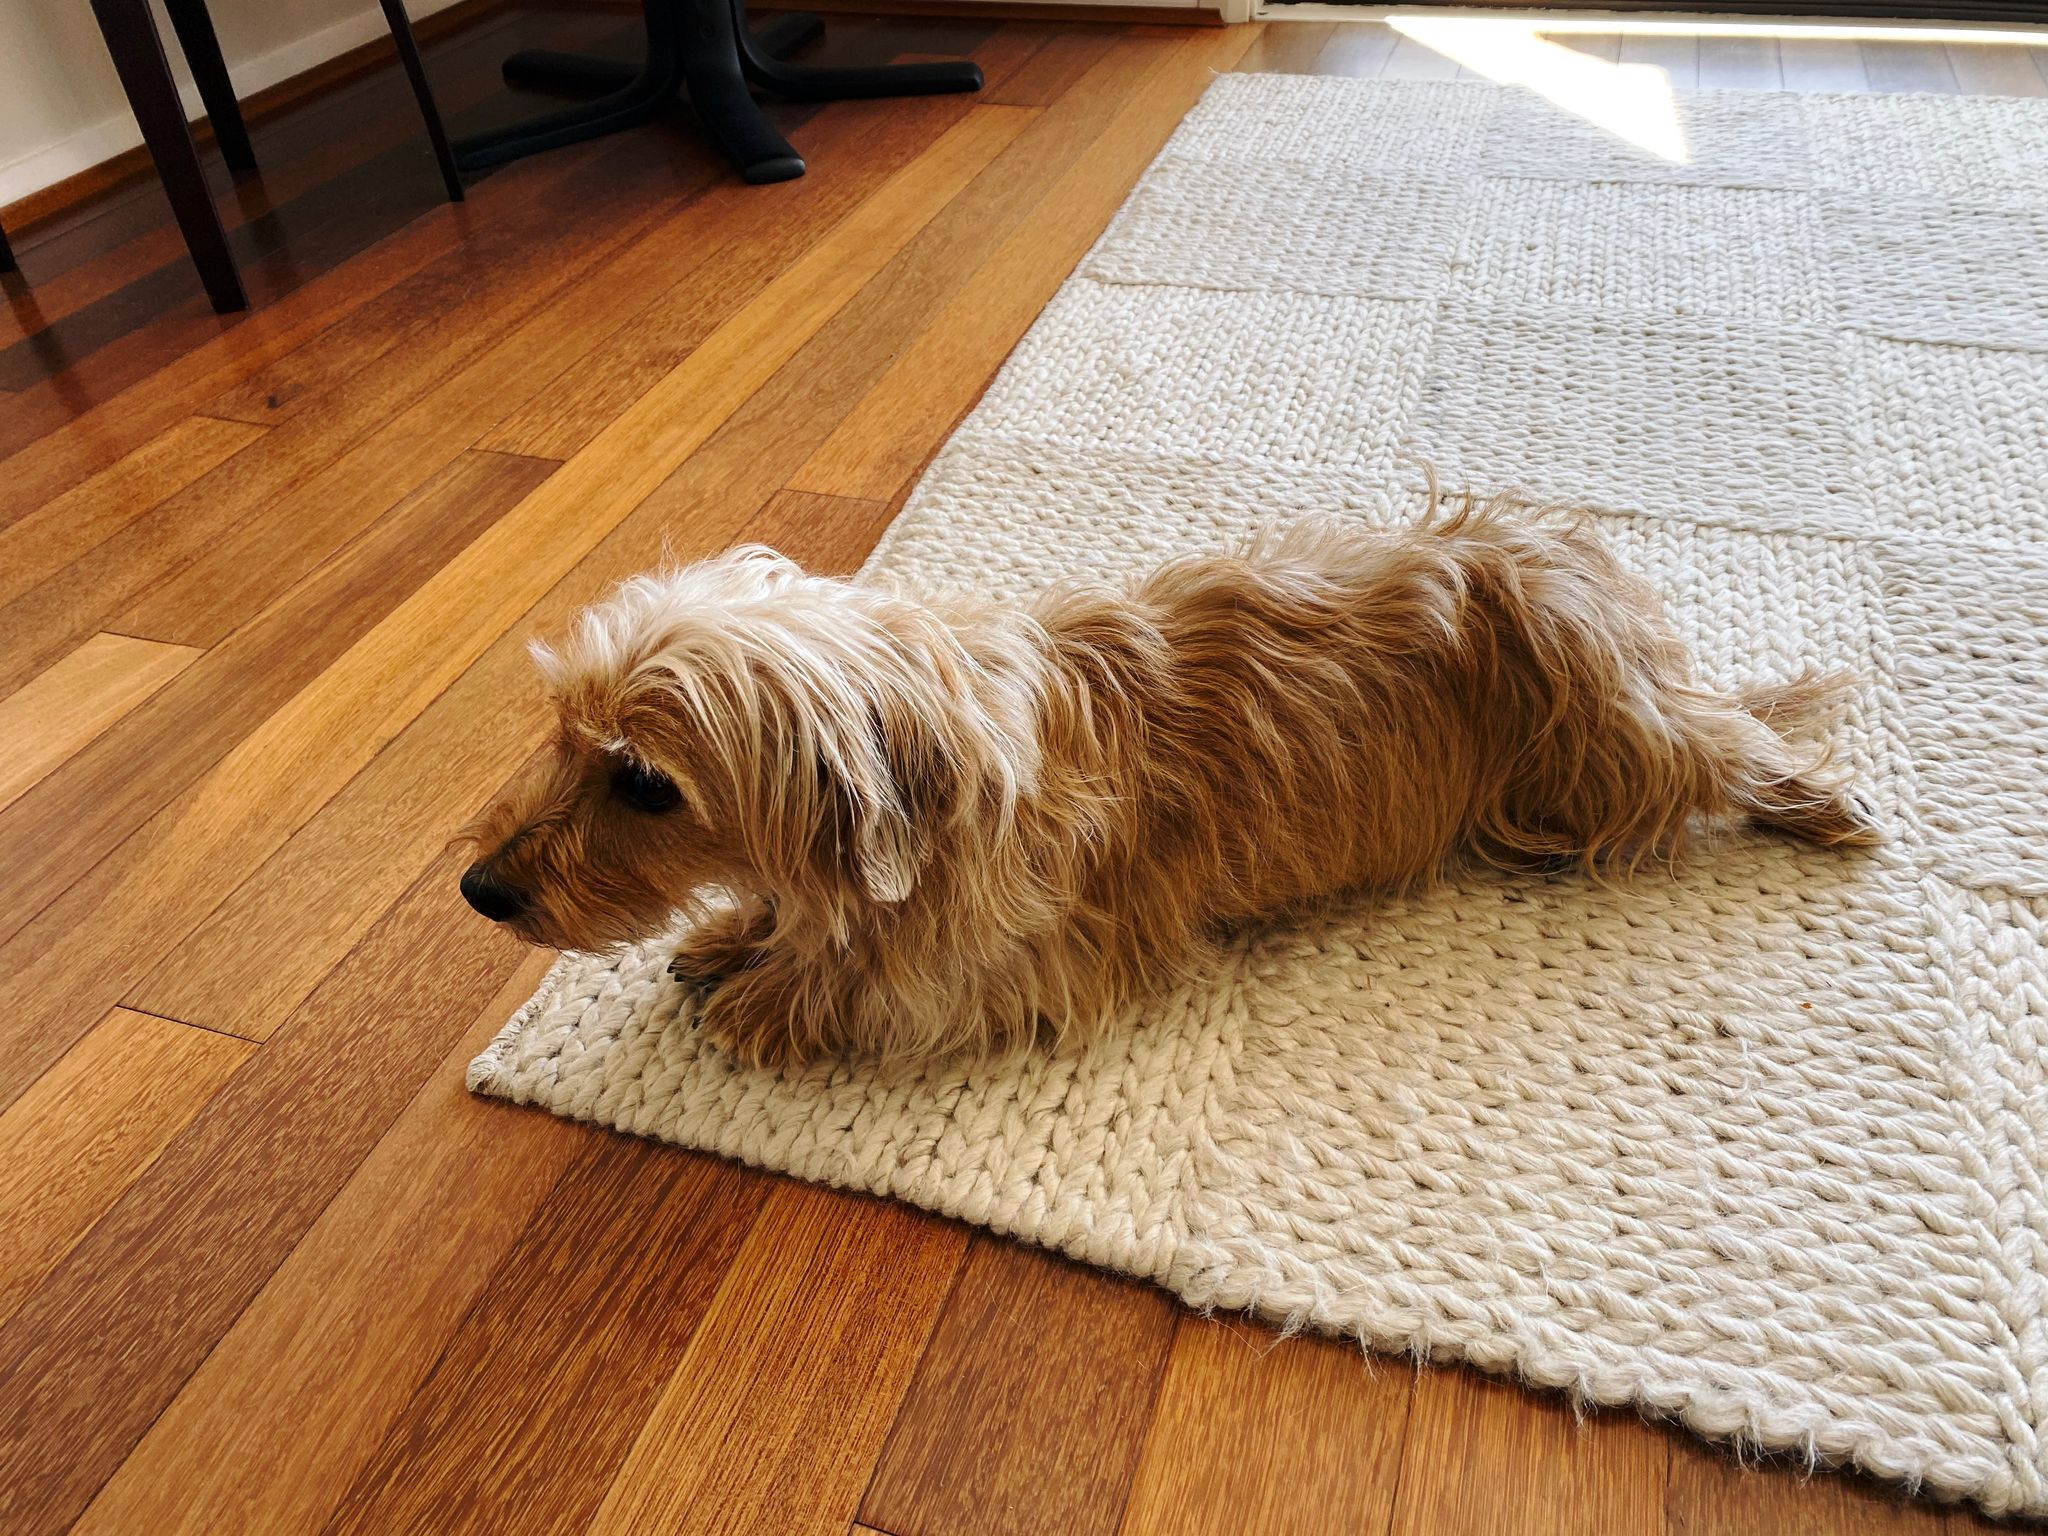 A photo of a scruffy blonde dog lying down on a white wool rug.